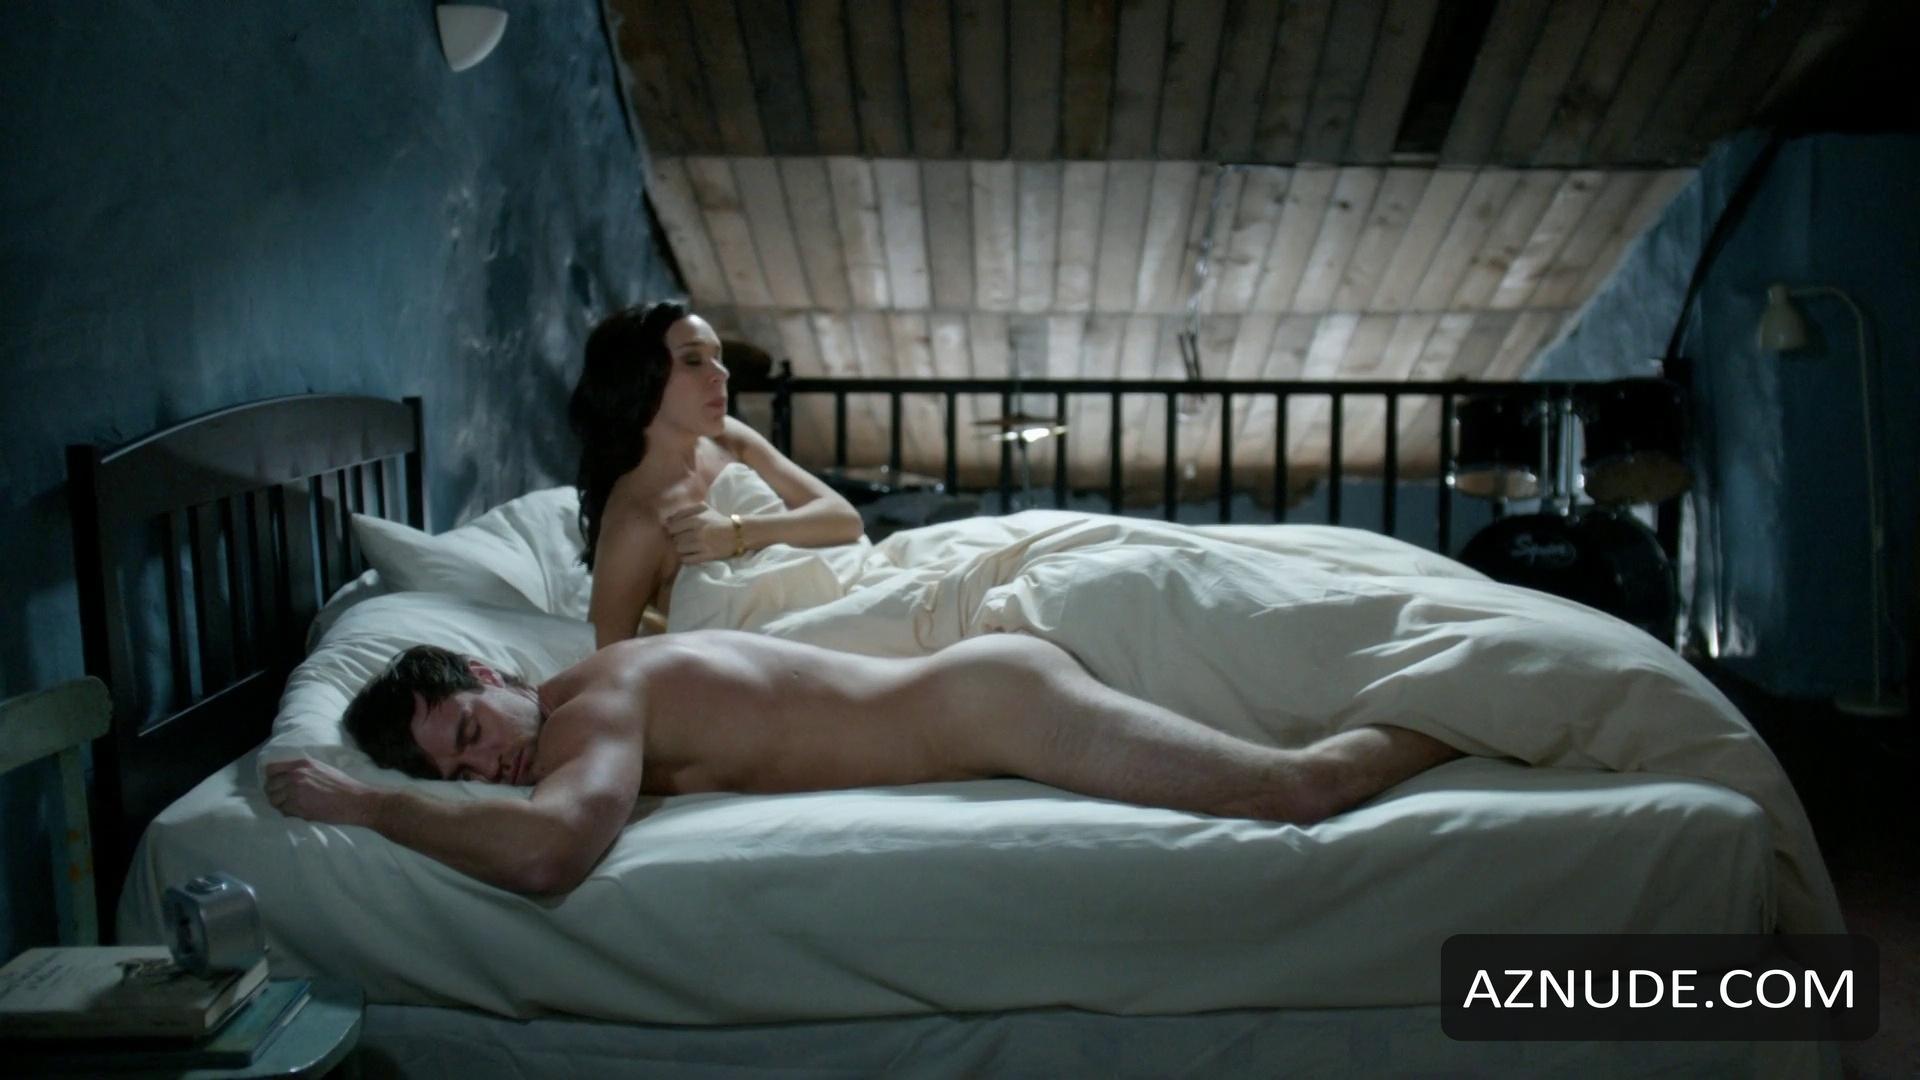 nude gay modles pics